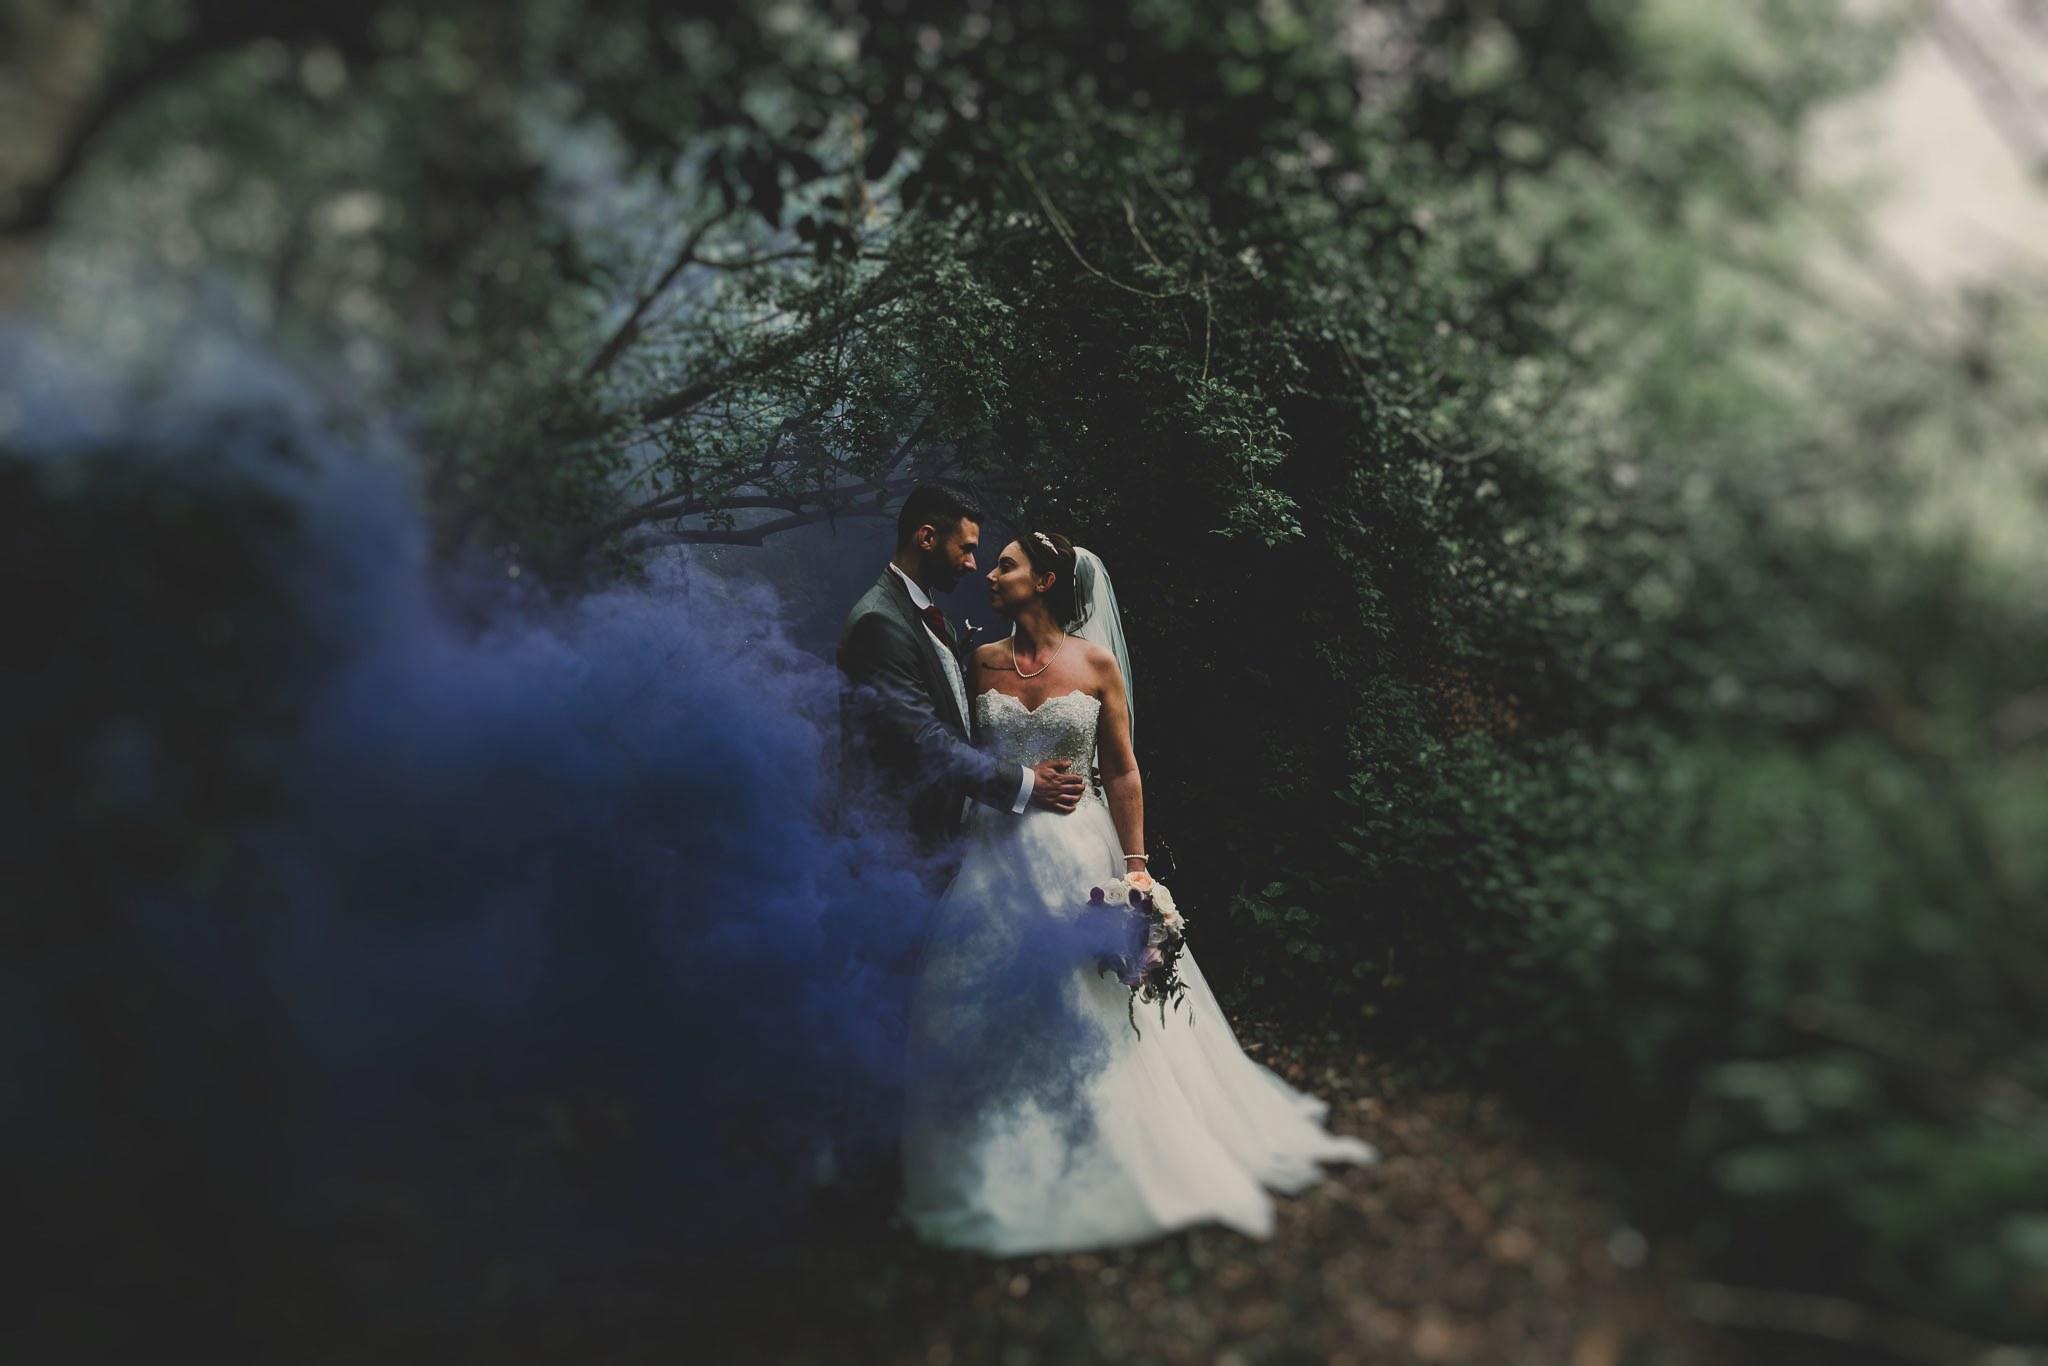 Alternative-wedding-photography-in-manchester-jade-maguire-photograhy (22).jpg